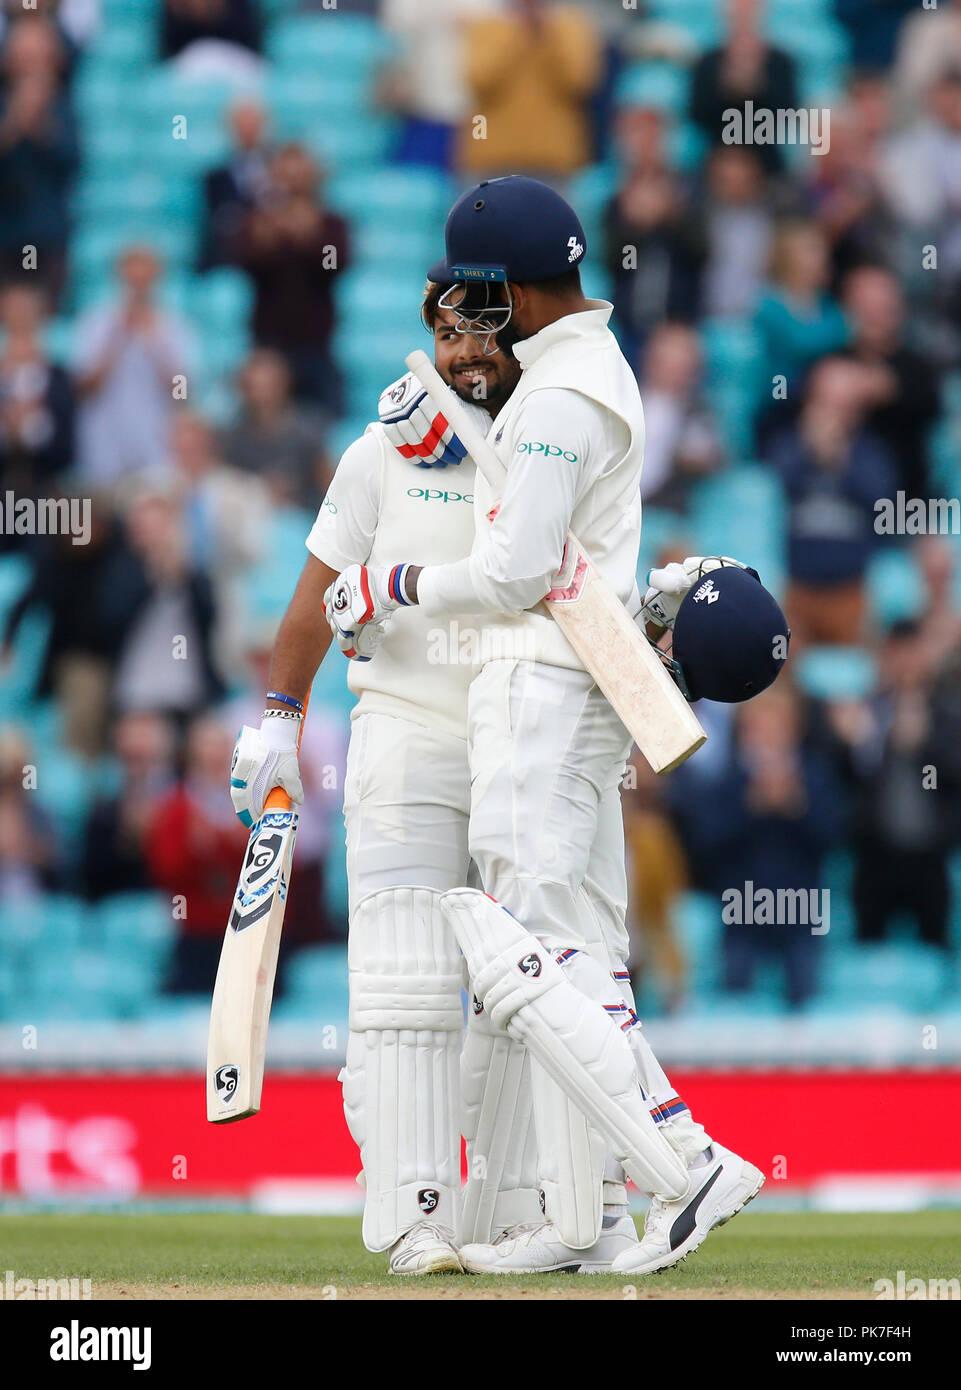 Kia Oval, London, UK. 11th Sep, 2018. Specsavers International Test Match Cricket, 5th test, day 5; KL Rahul of India congratulates batting partner Rishabh Pant on reaching his century Credit: Action Plus Sports/Alamy Live News - Stock Image